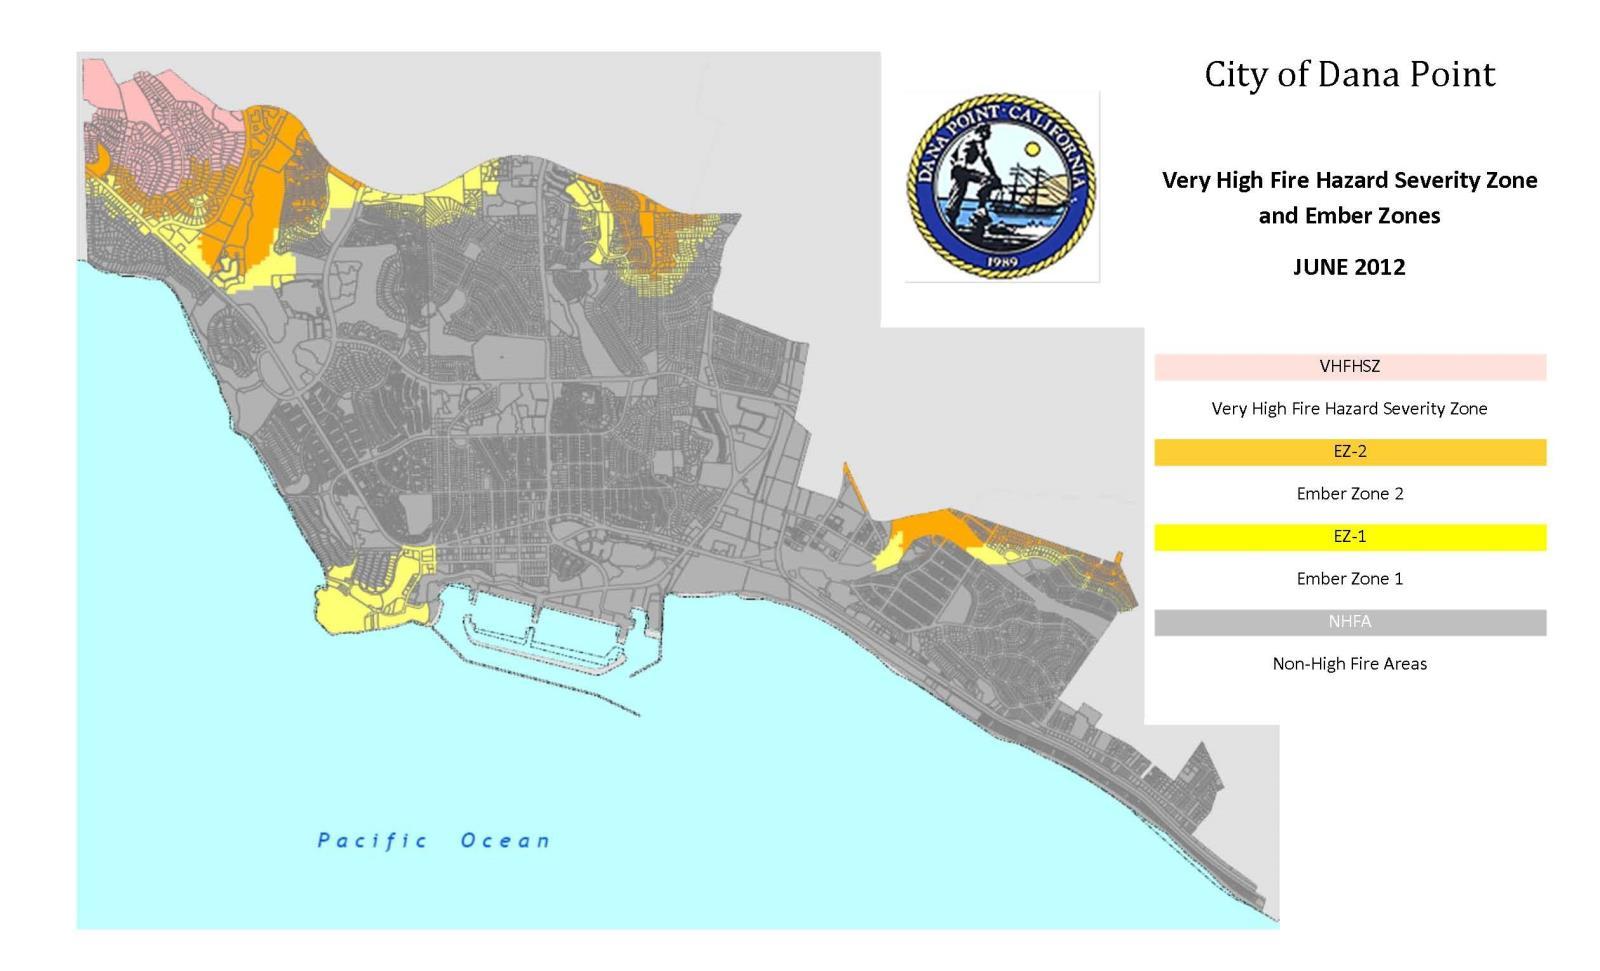 Fire Hazard Severity Zones | City of Dana Point on